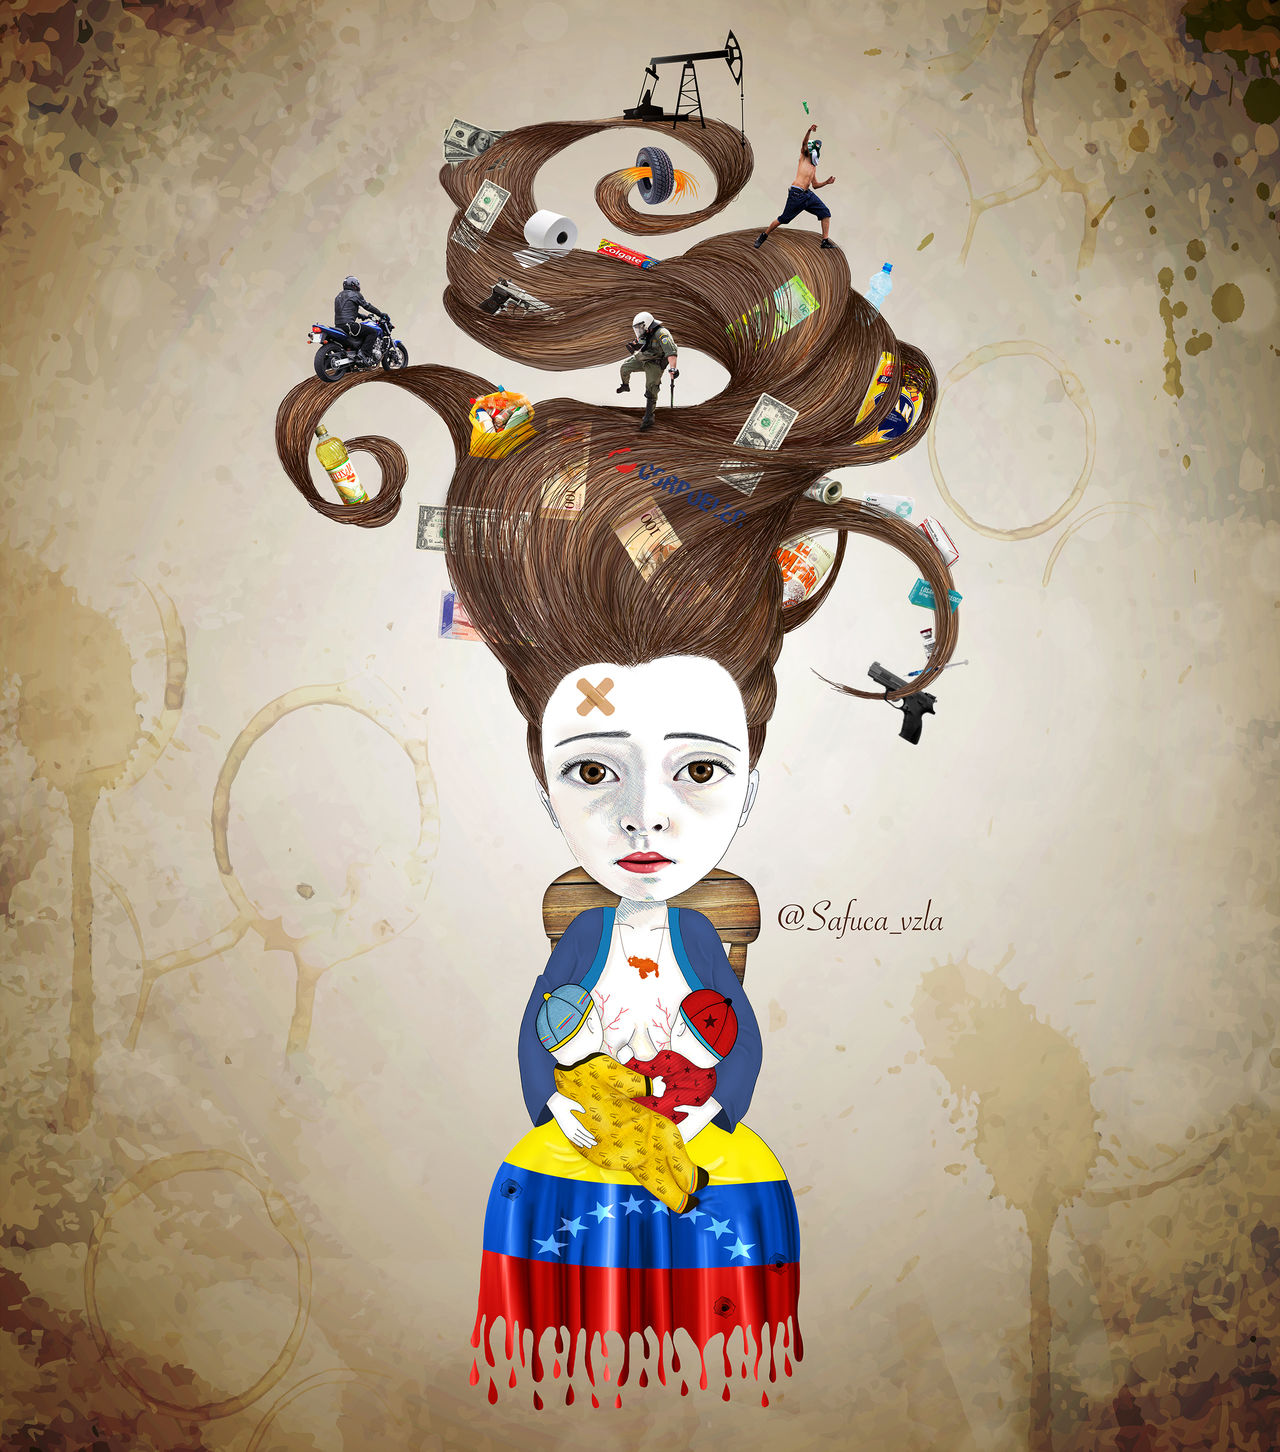 Venezuela Safuca Ilustration Crisis Archival